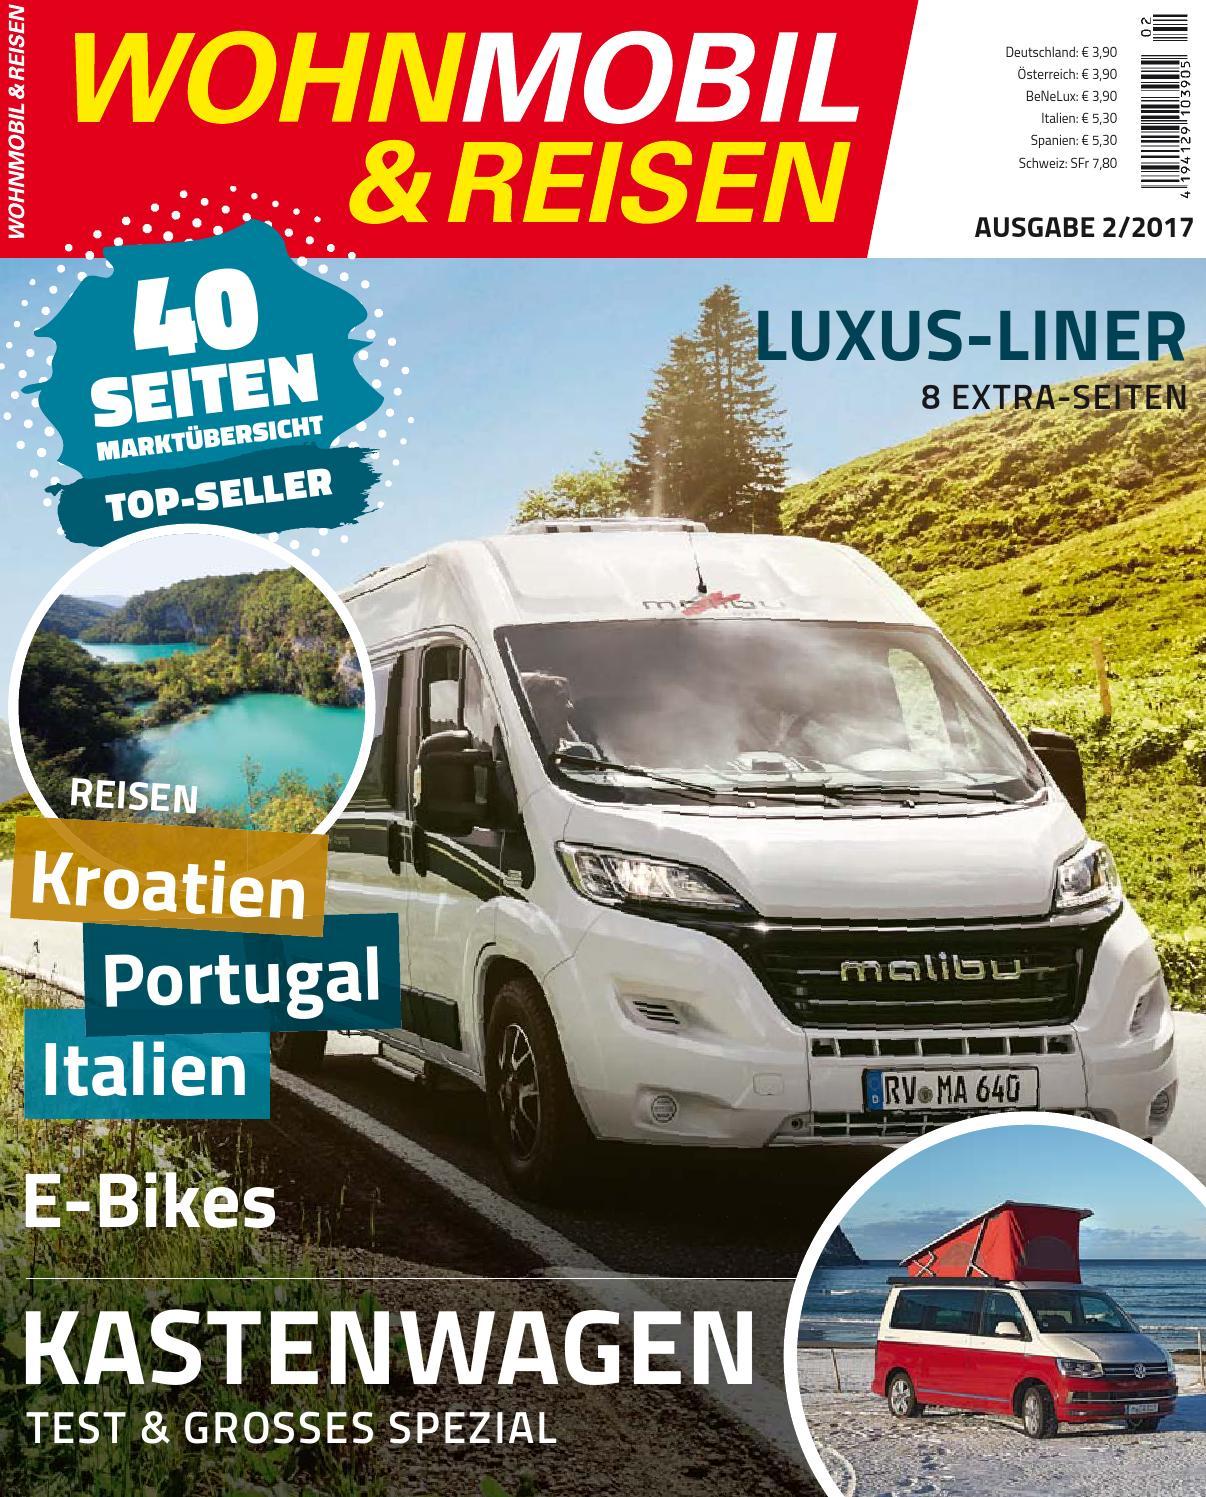 WOHNMOBIL & REISEN 2/2017 by Family Home Verlag GmbH - issuu